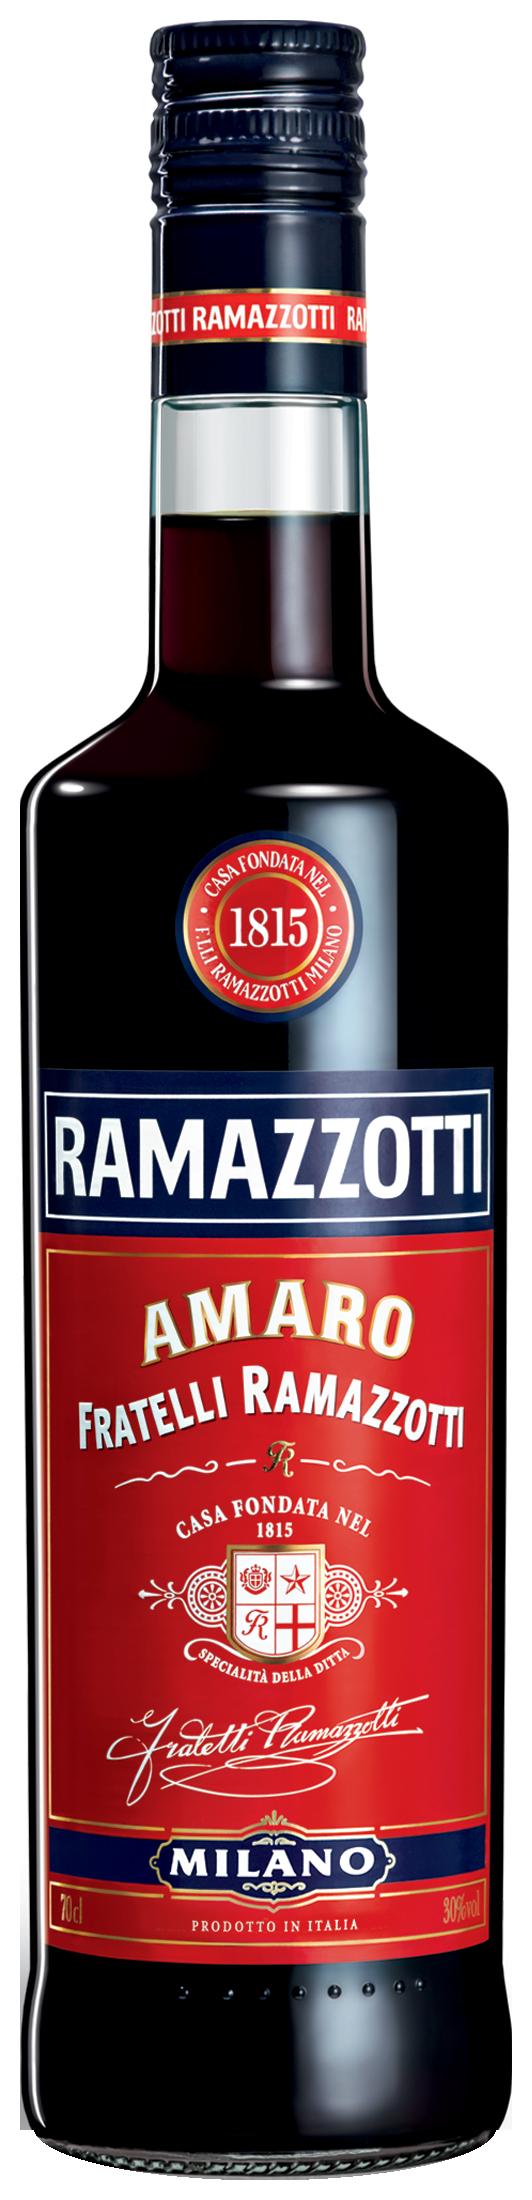 Packshot Amaro Ramazzotti